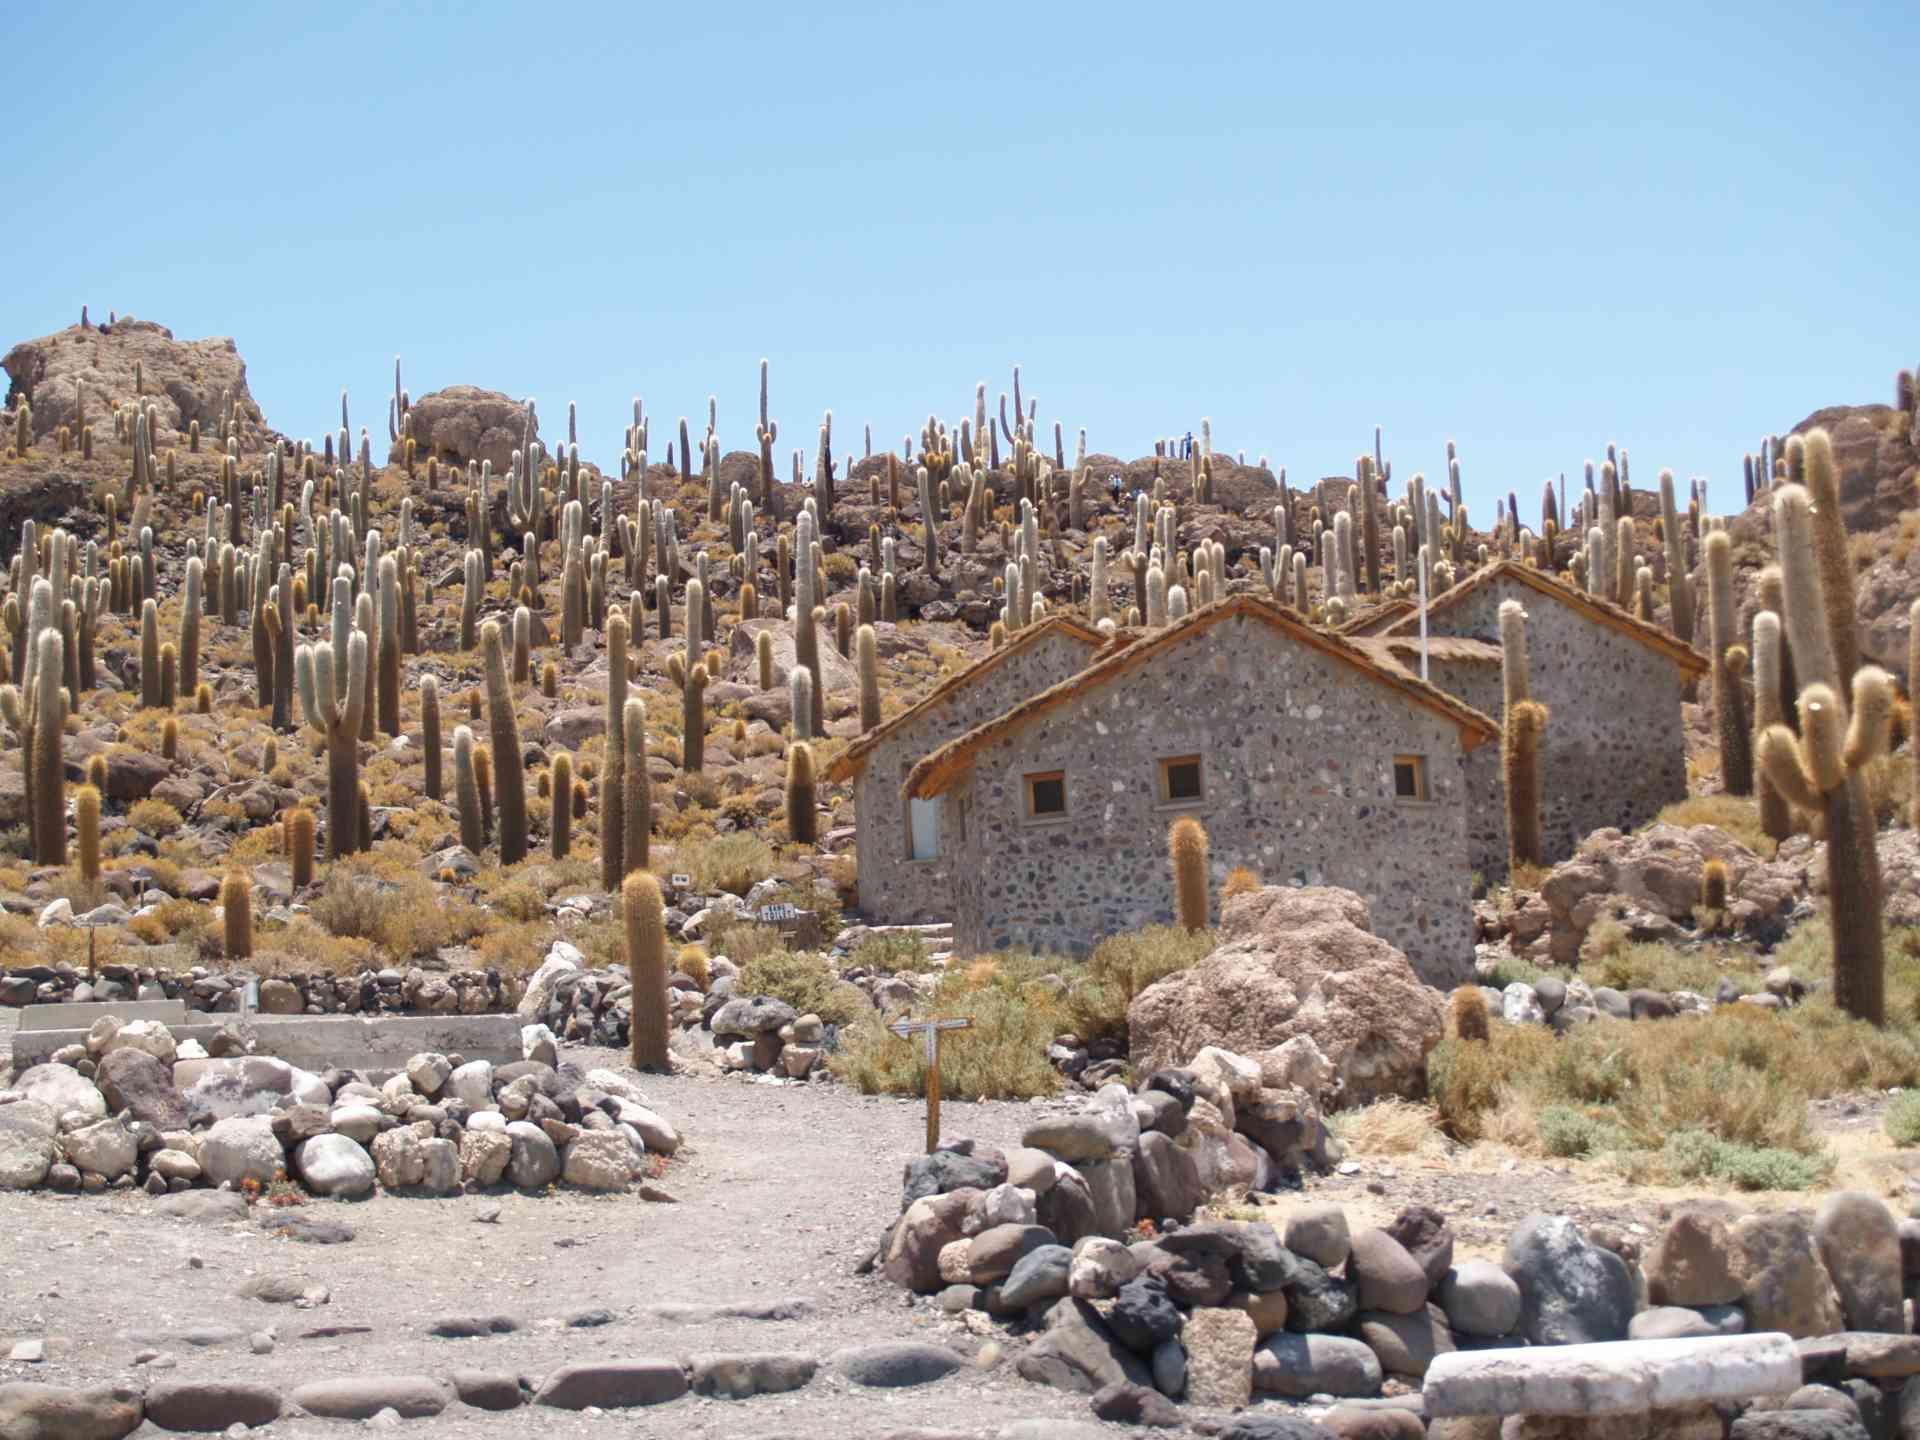 Uyuni, Bolivia by Annelieke Huijgens